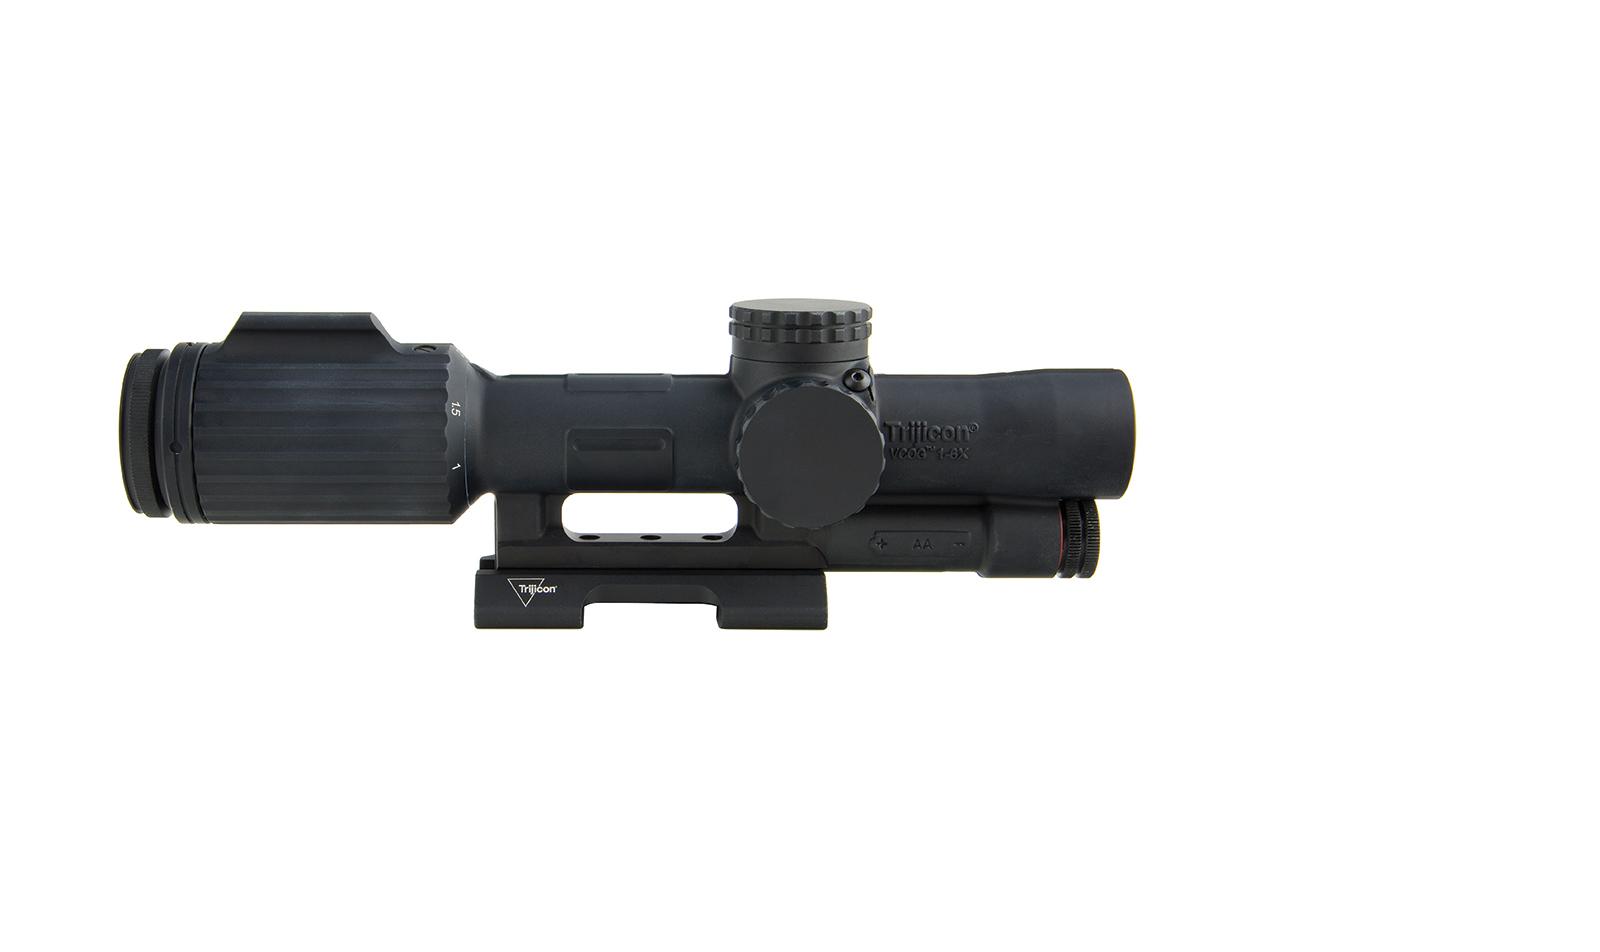 VC16-C-1600049 angle 6